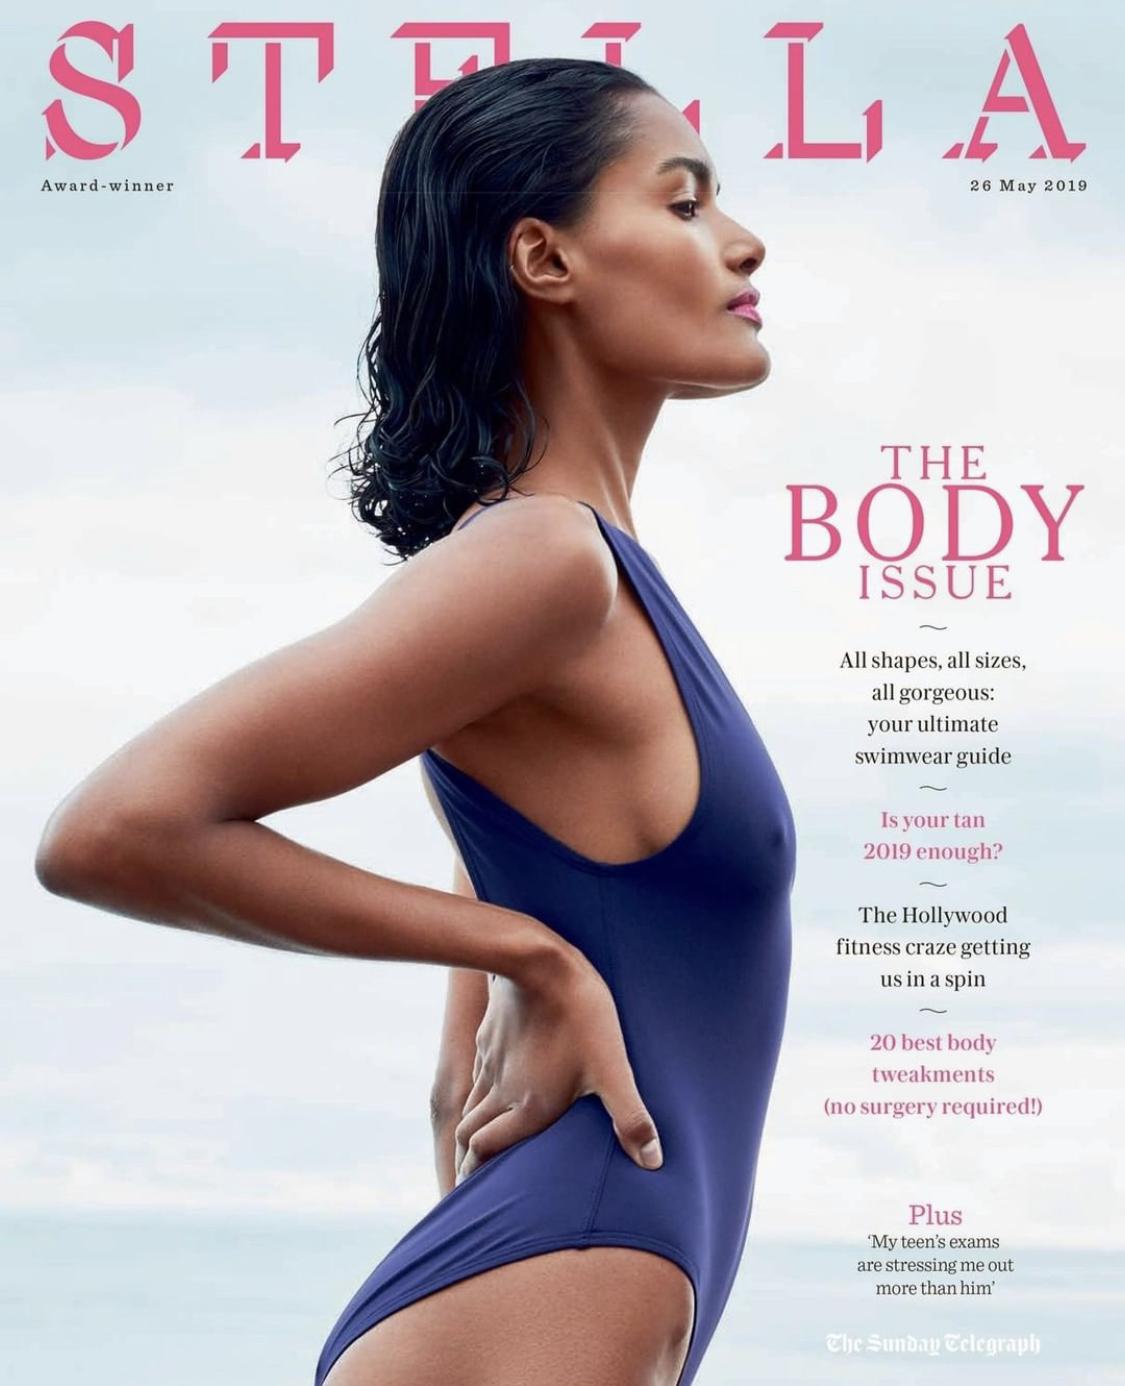 Stella Magazine by the Telegraph